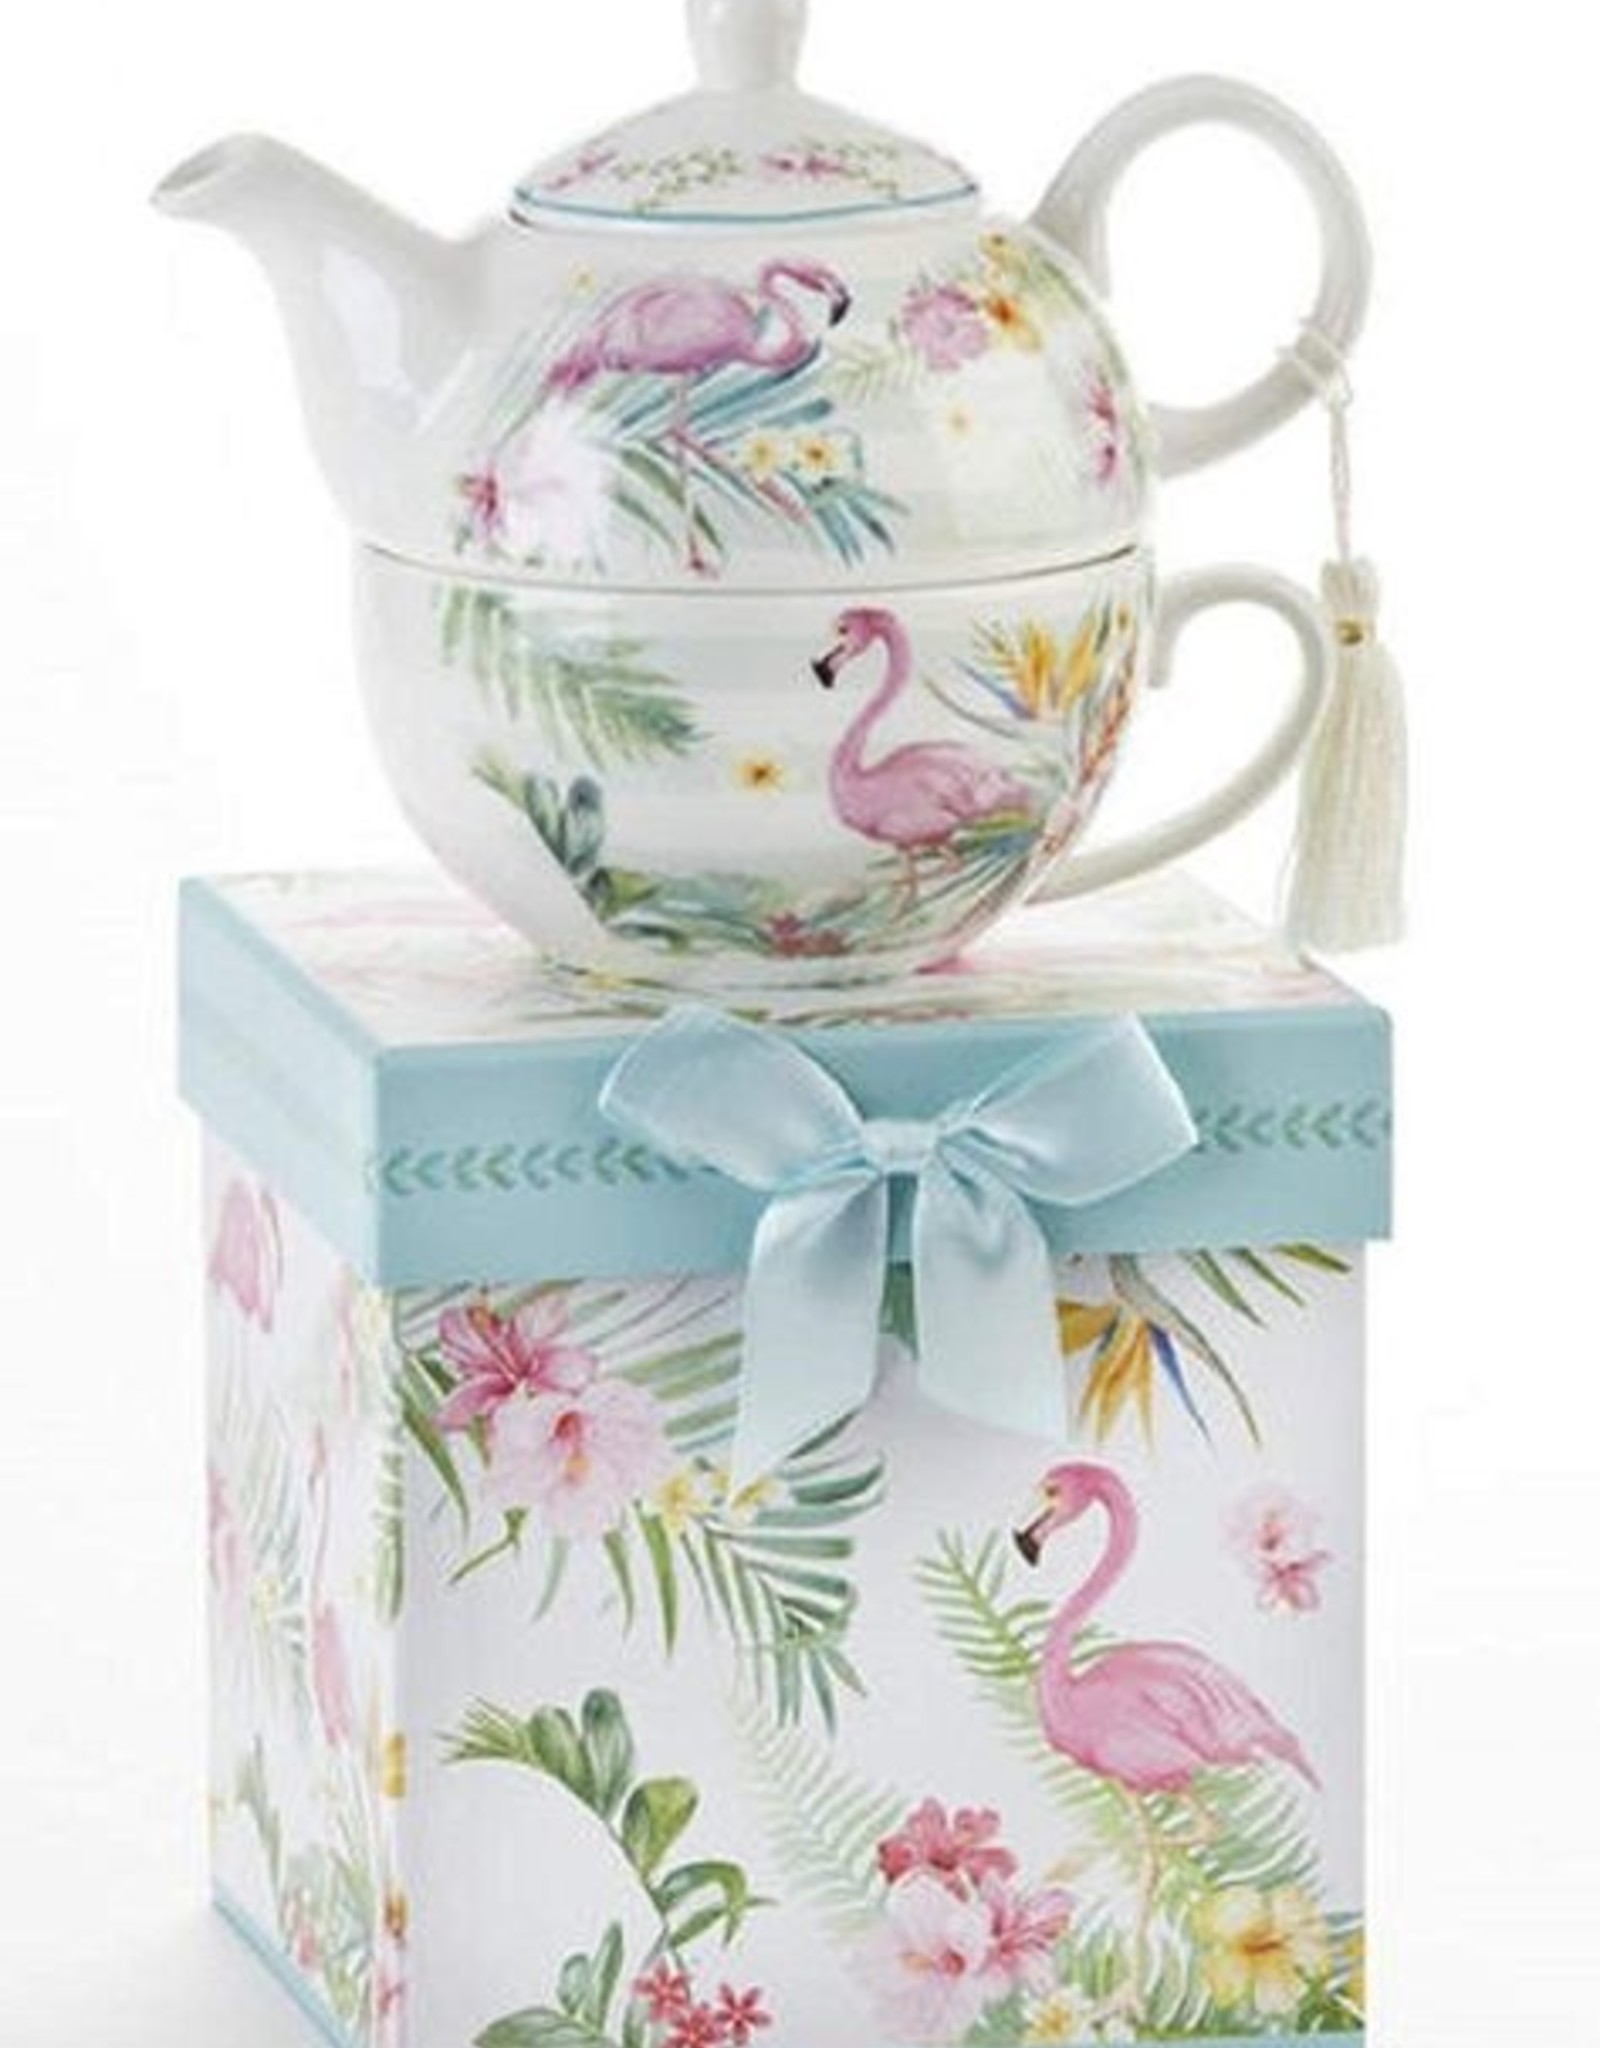 Tea for One - Pink Flamingo